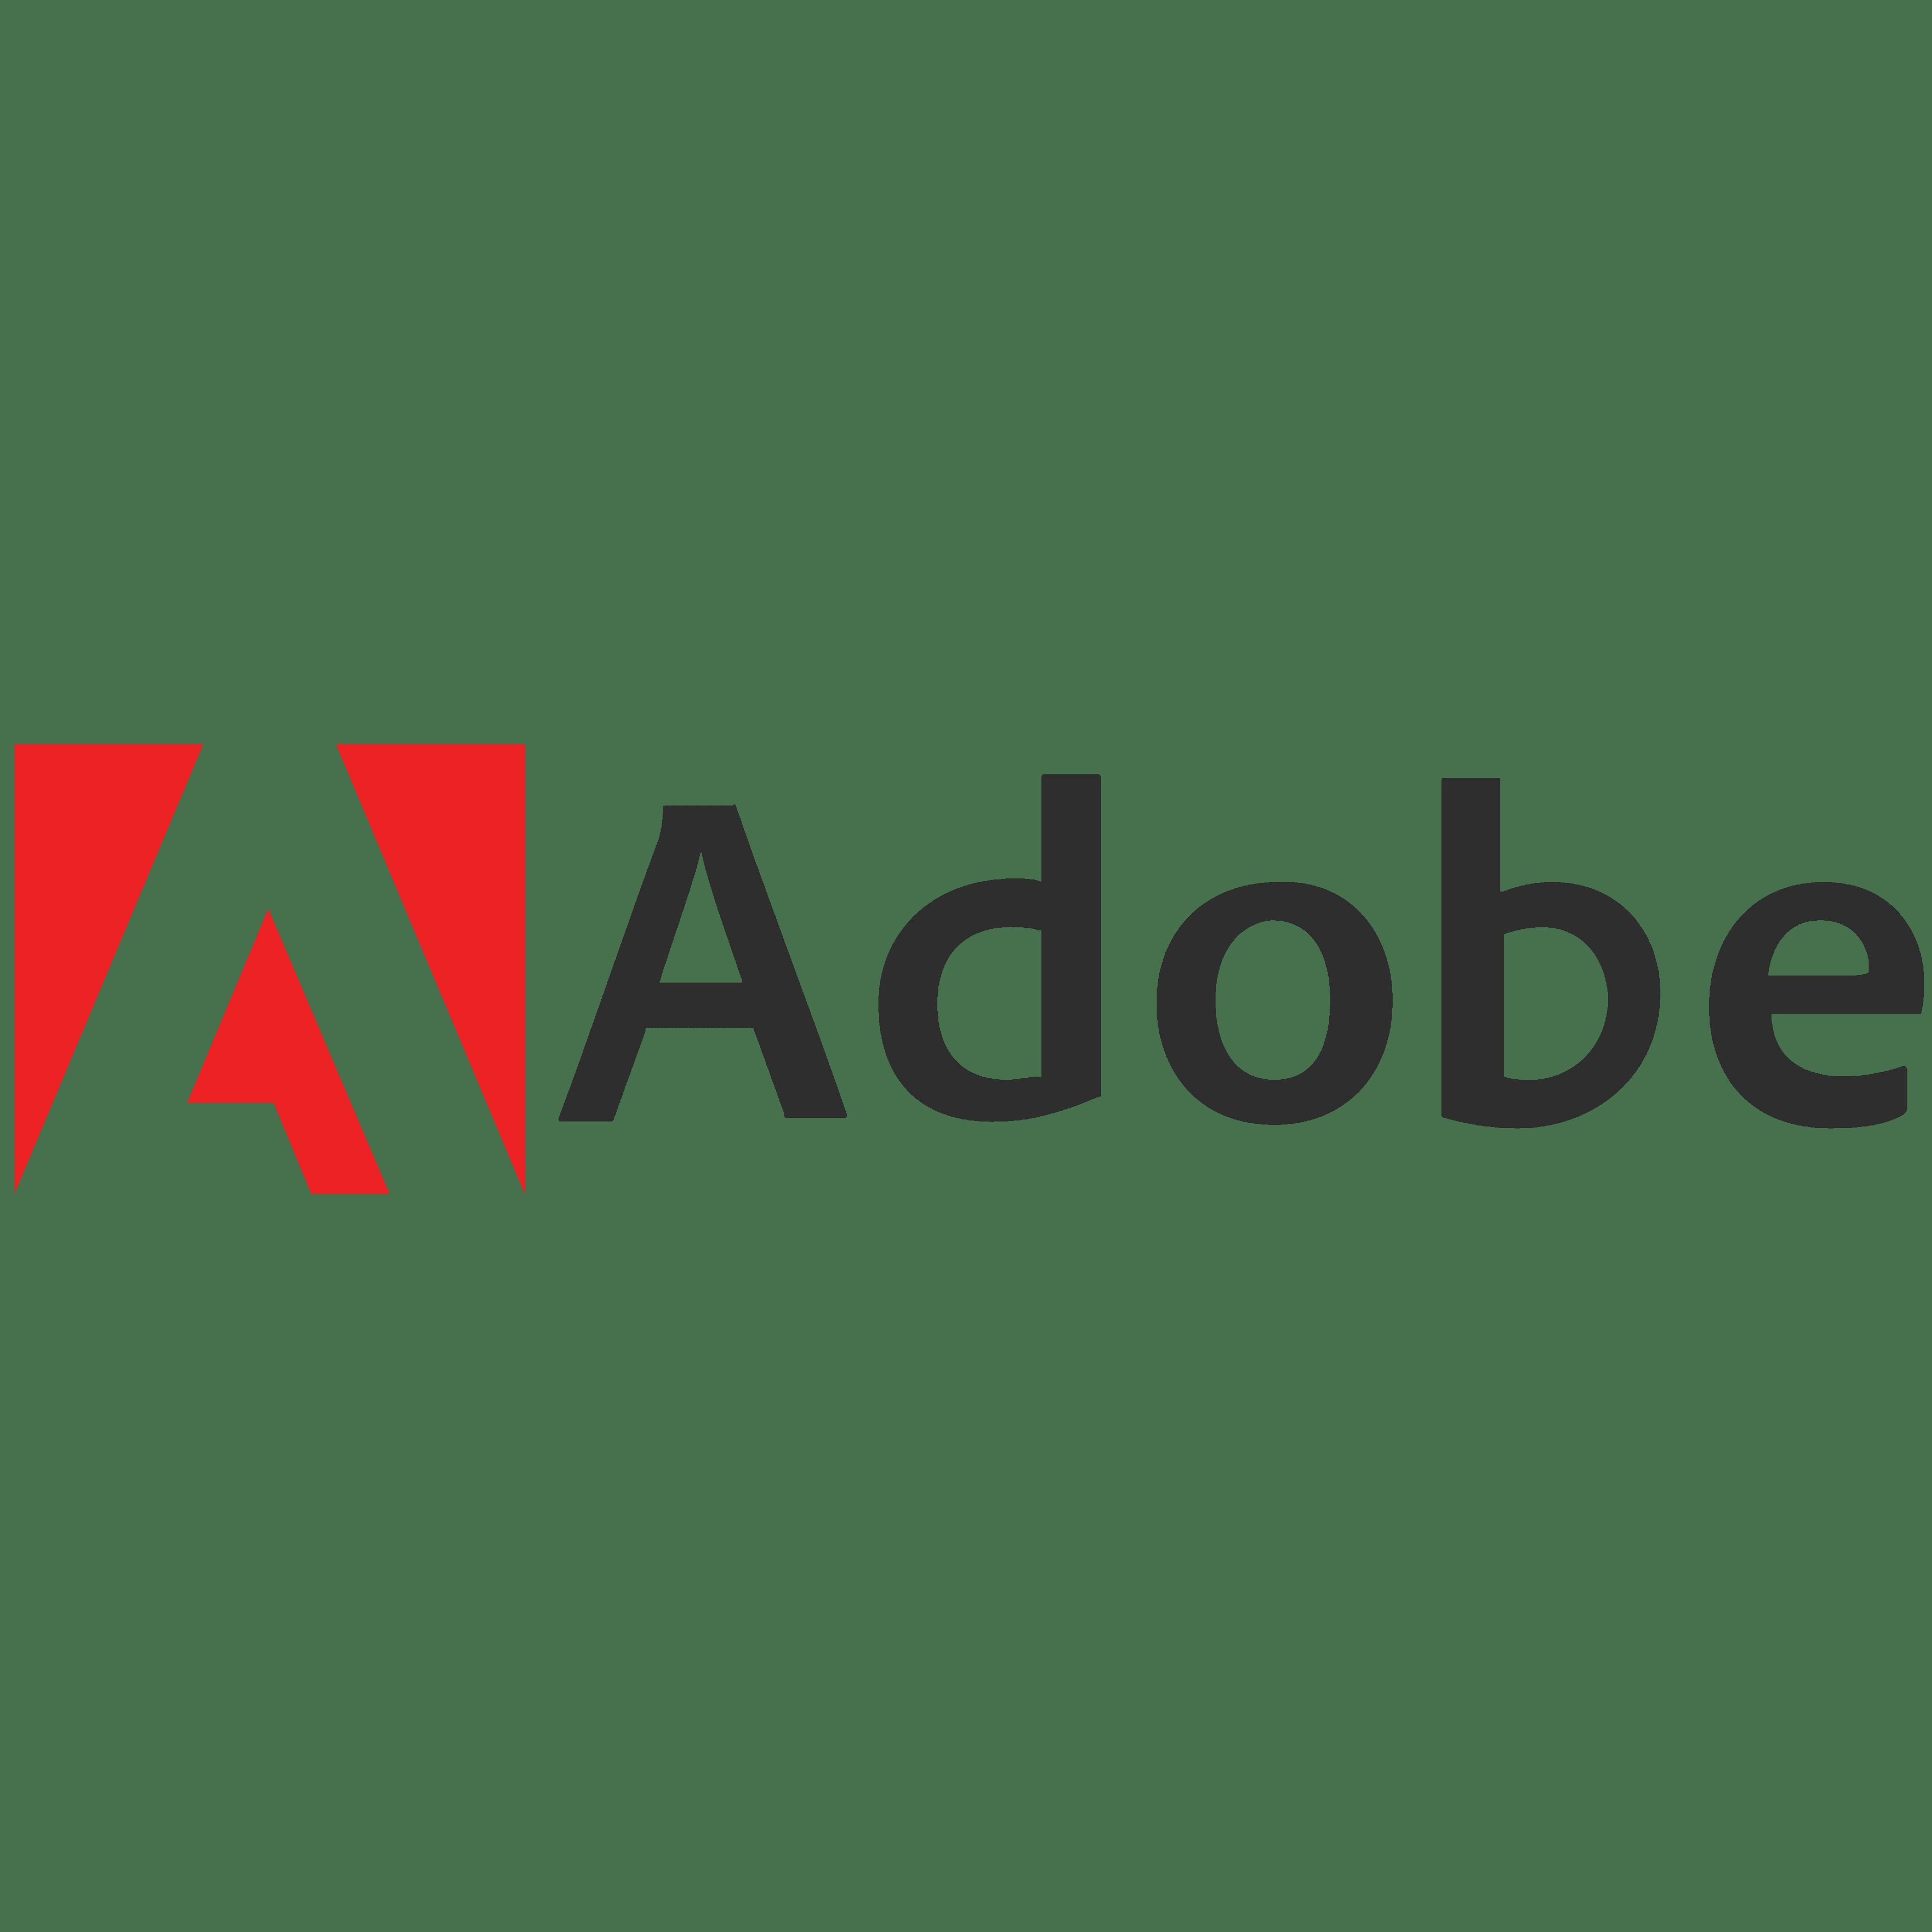 Adobe Aktienanalyse | Bilanzanalyse - Fundamentale Aktienanalyse